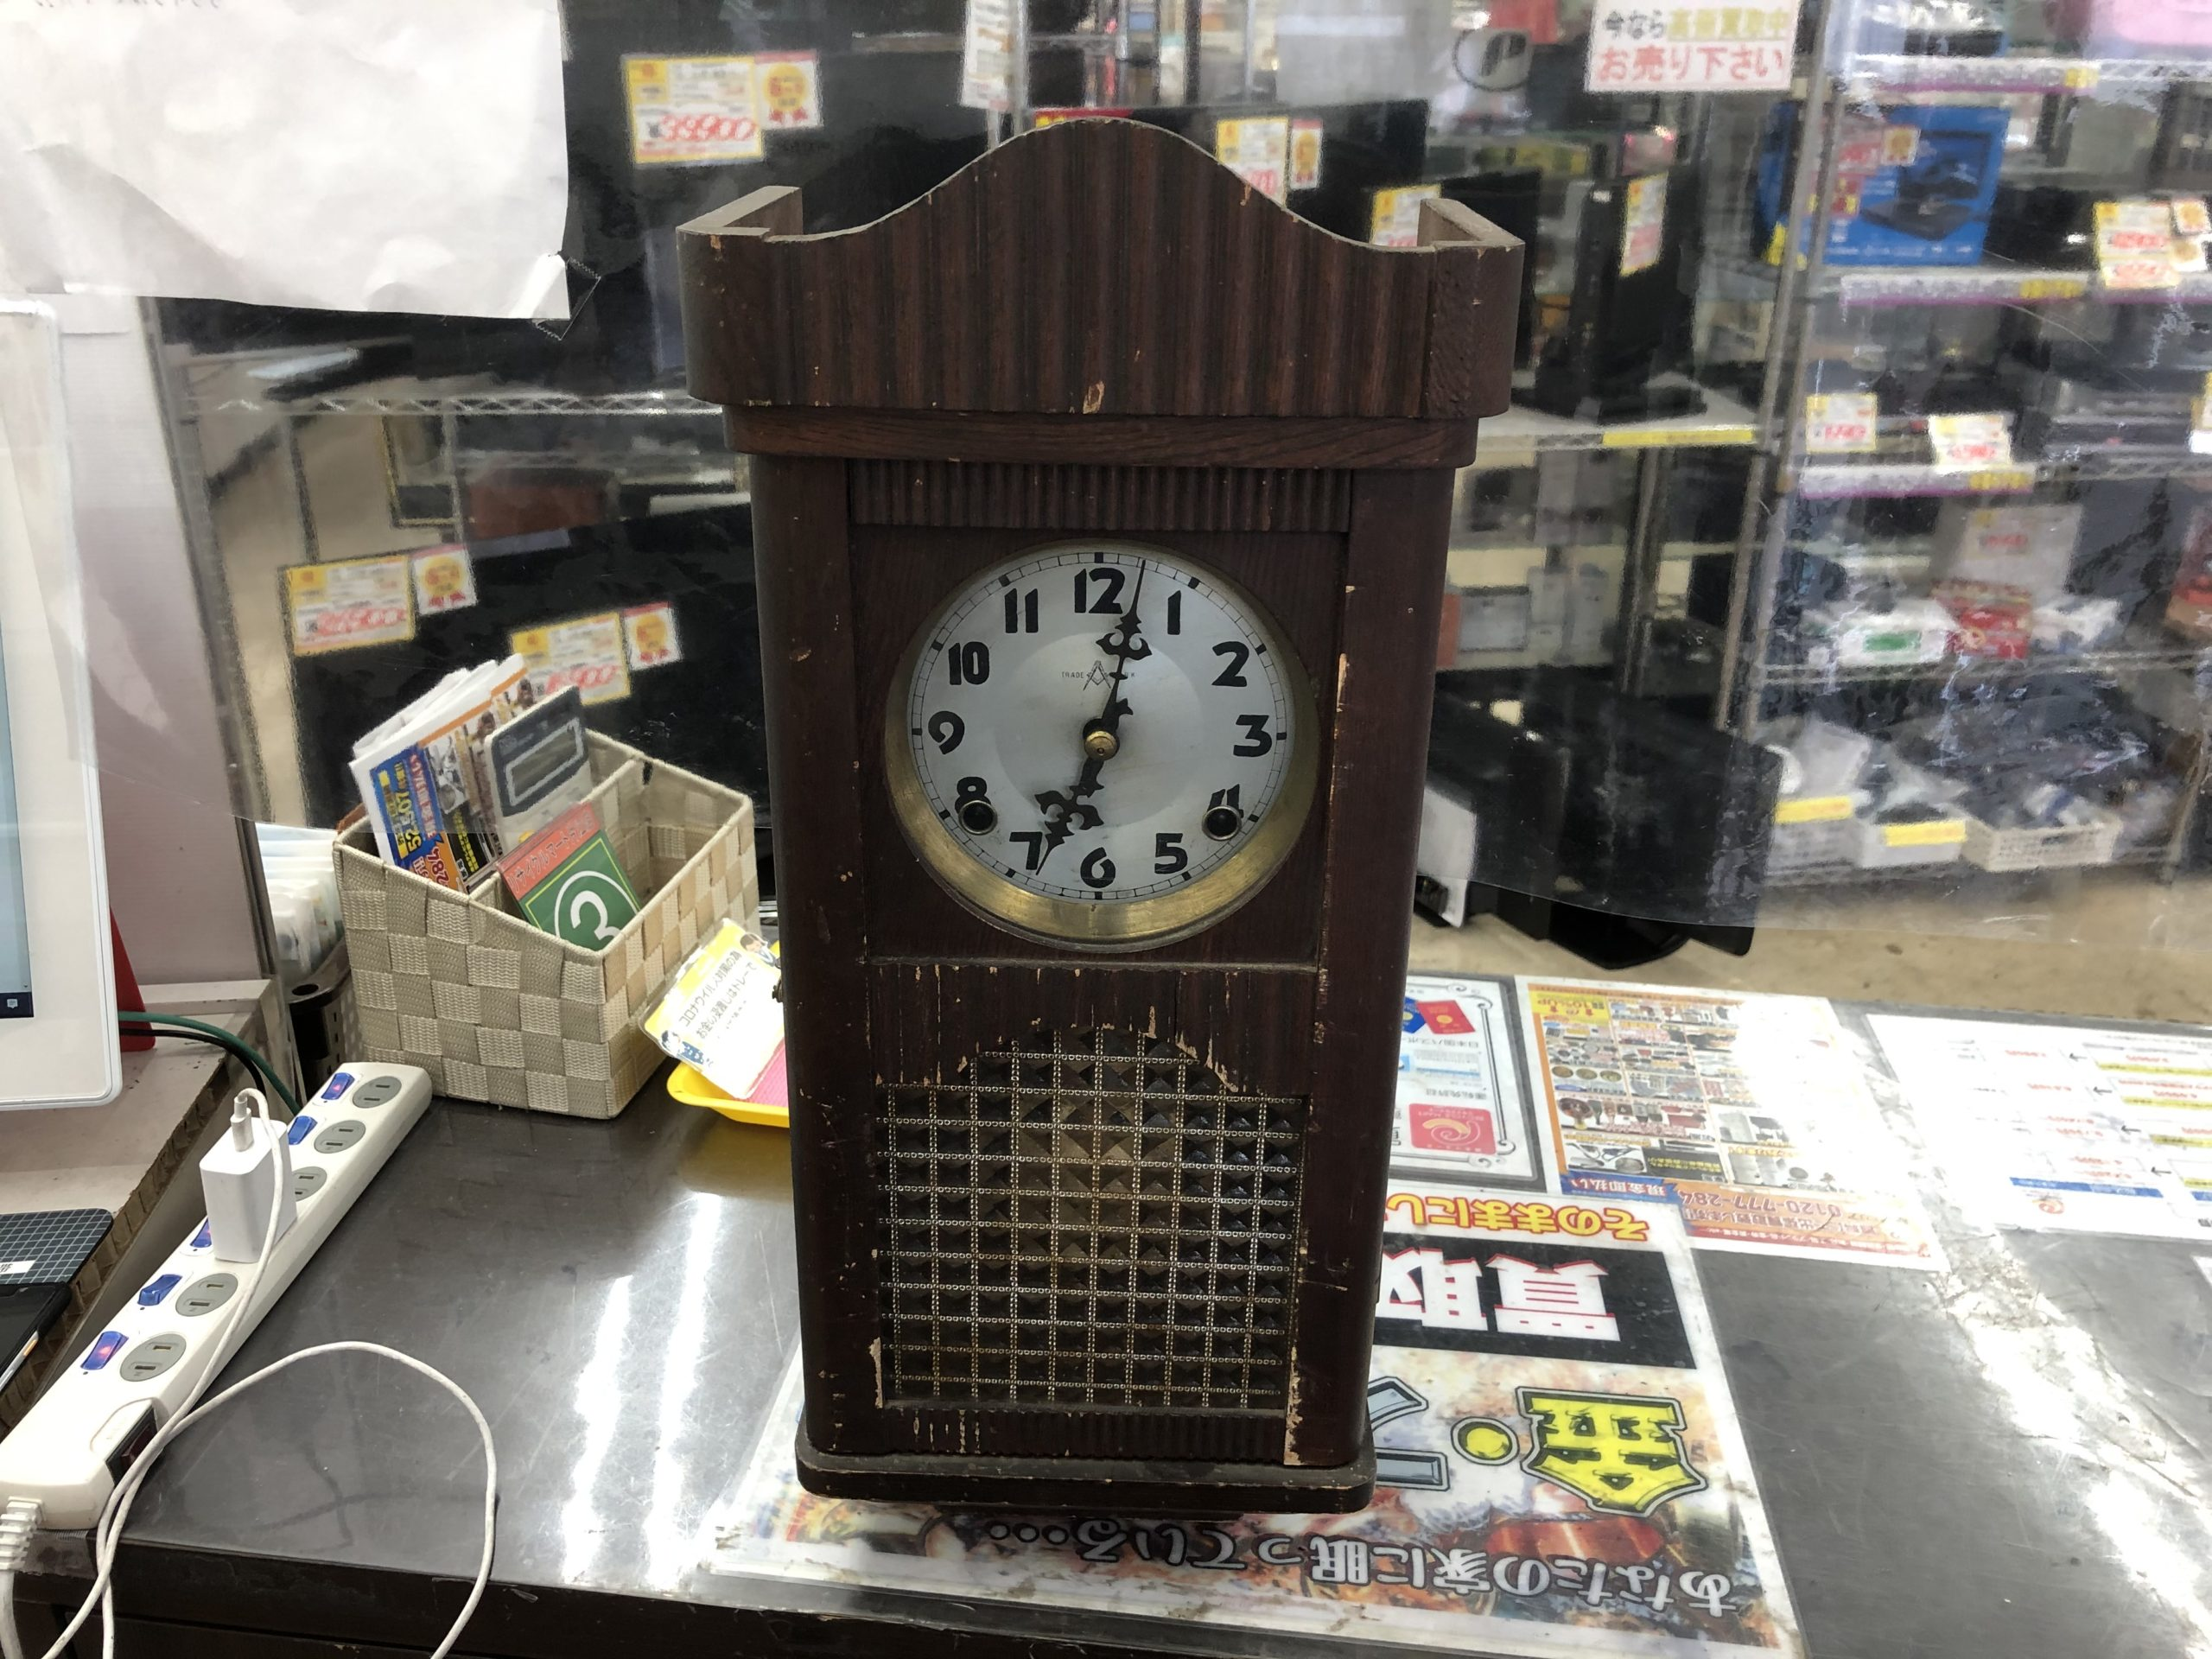 AICHI 愛知時計 柱時計 掛時計 振り子 レトロ アンティーク をお買取りさせて頂きました!!の買取-